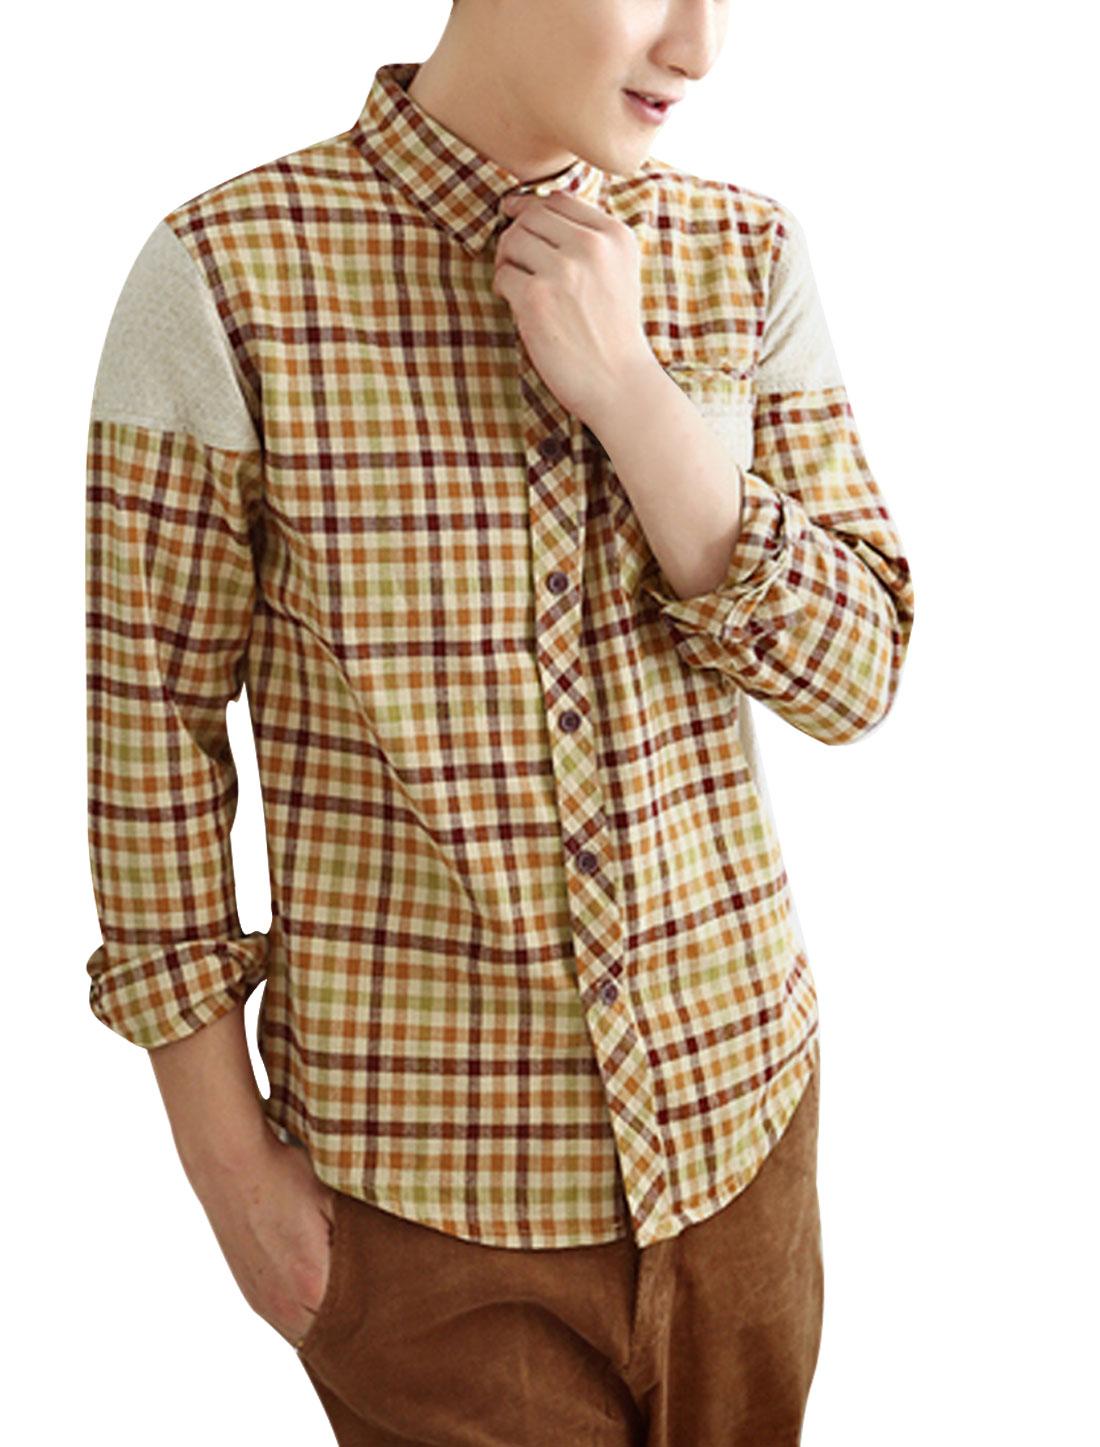 Men's Point Collar Ochre Plaids Patchwork With Pockets Long Sleeve Shirt M